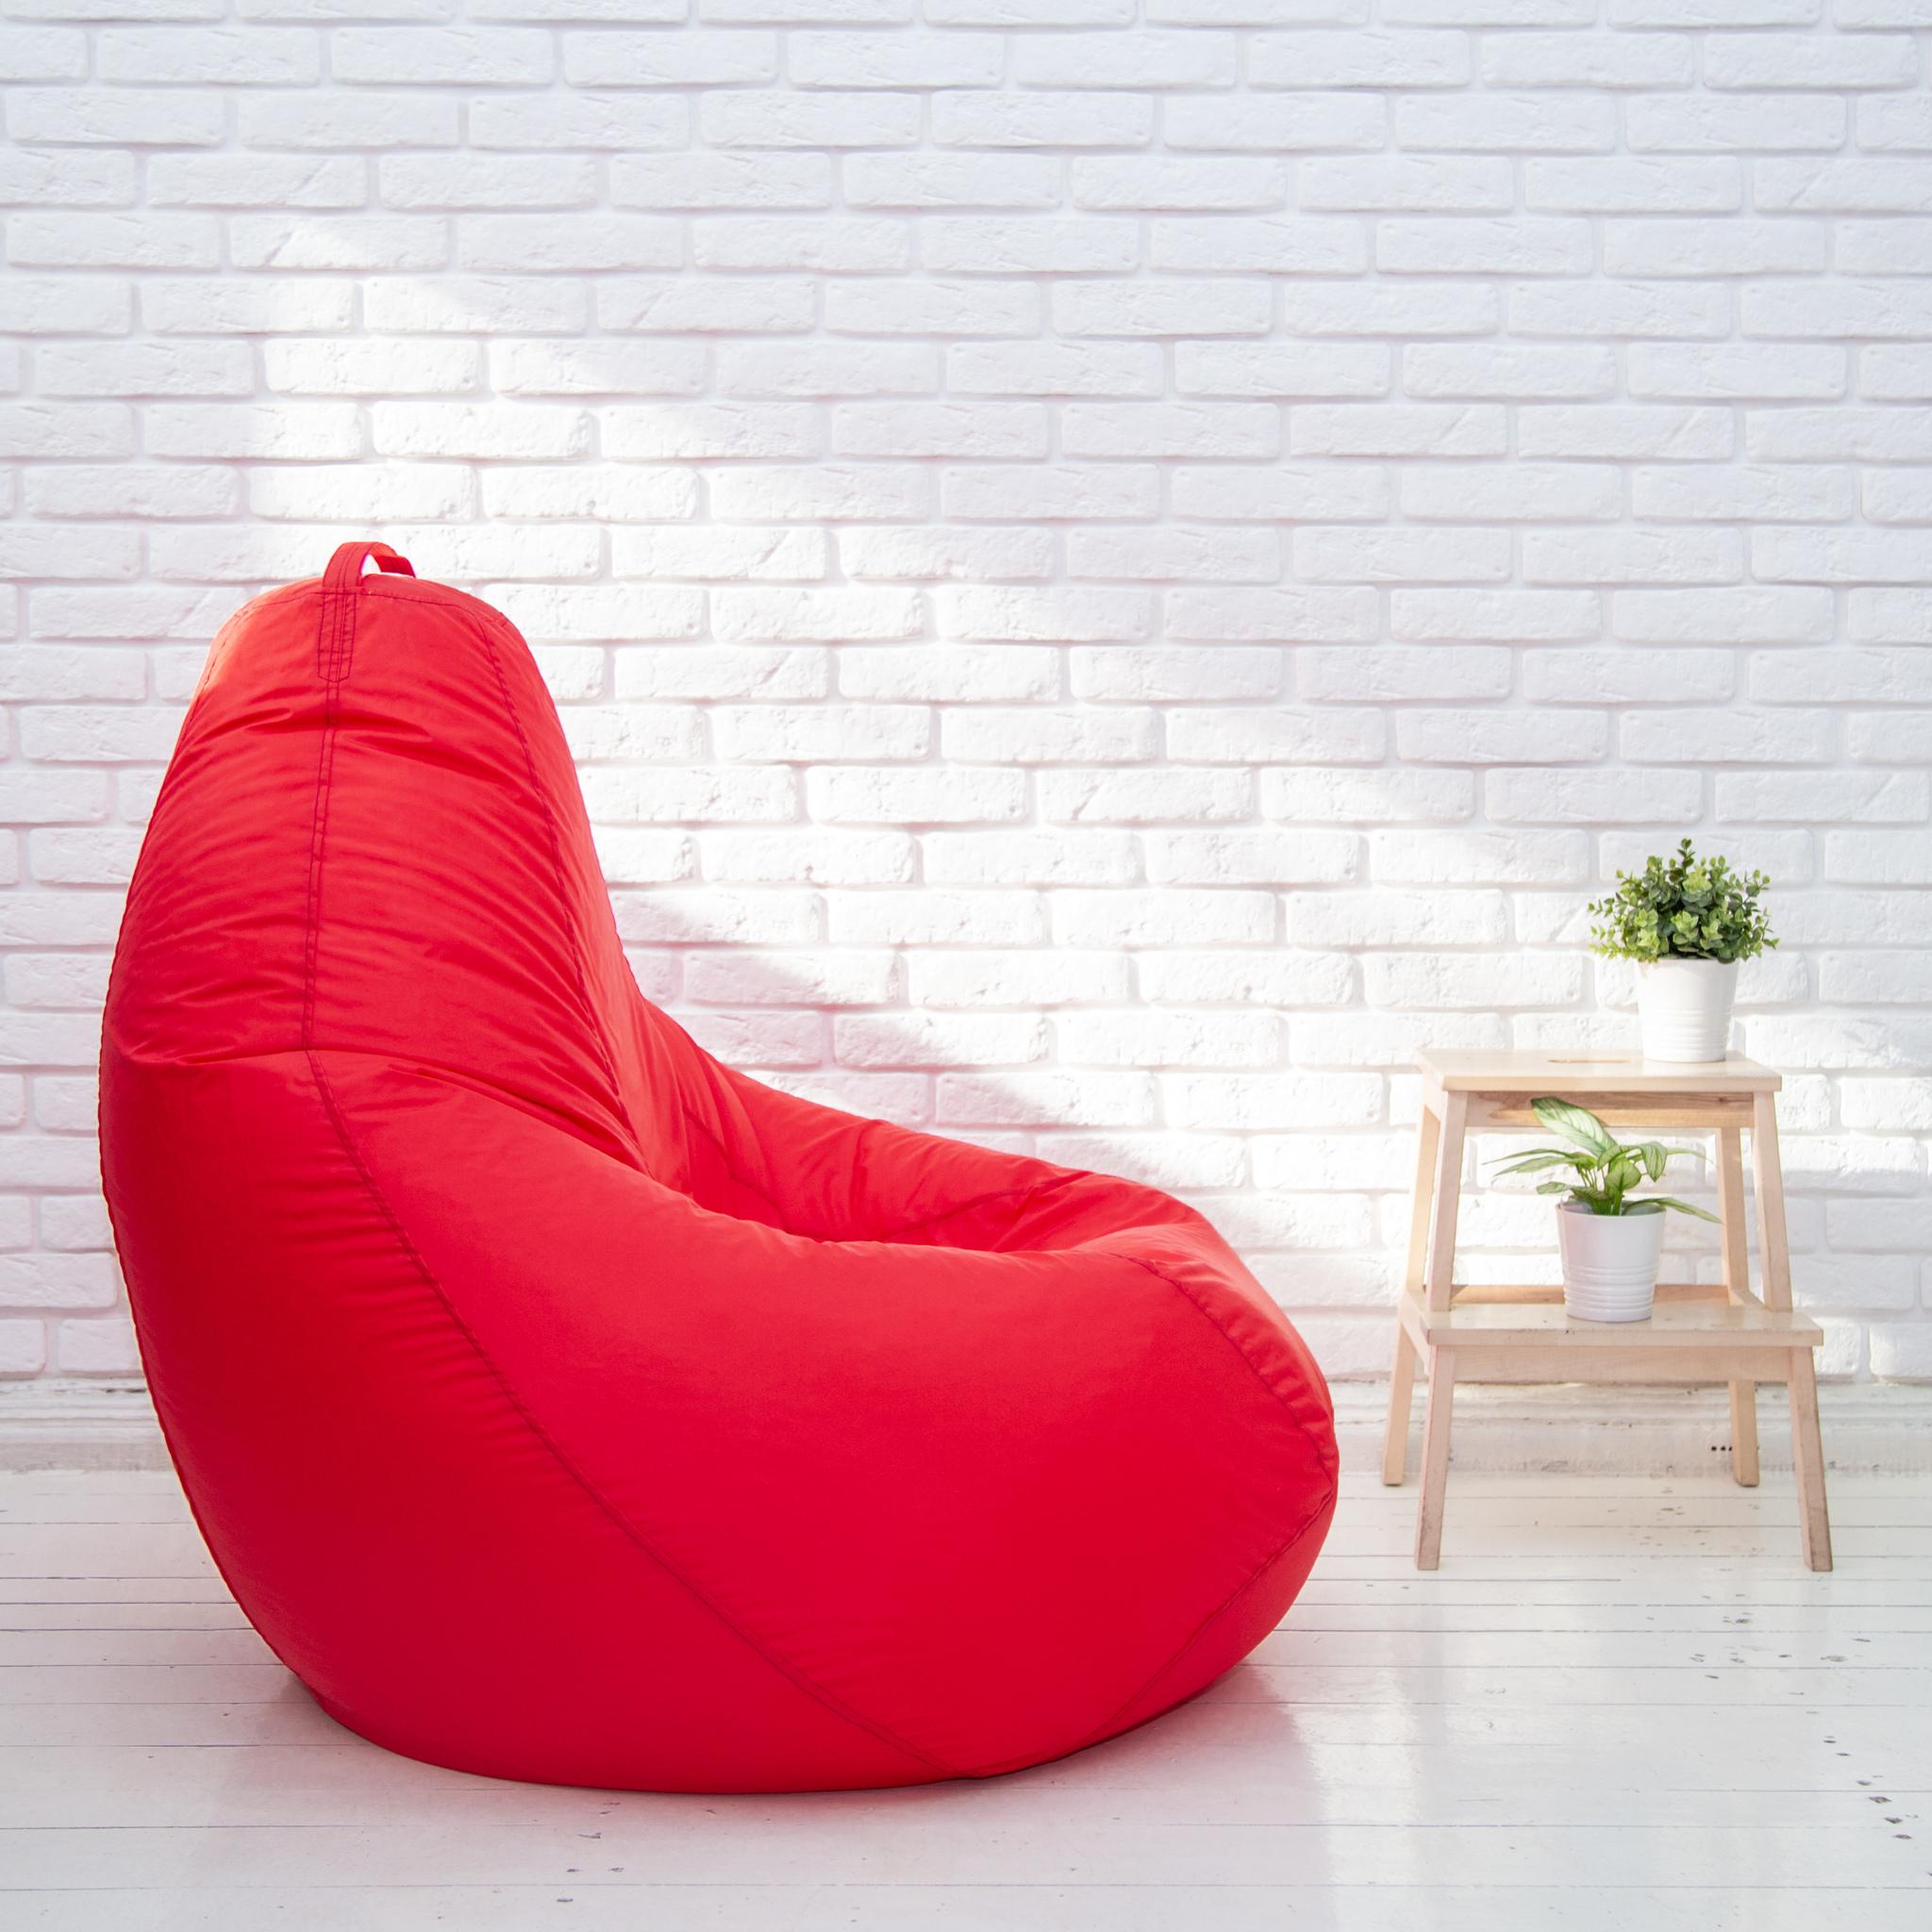 Груша XL плащёвка, несъёмный чехол (красная)